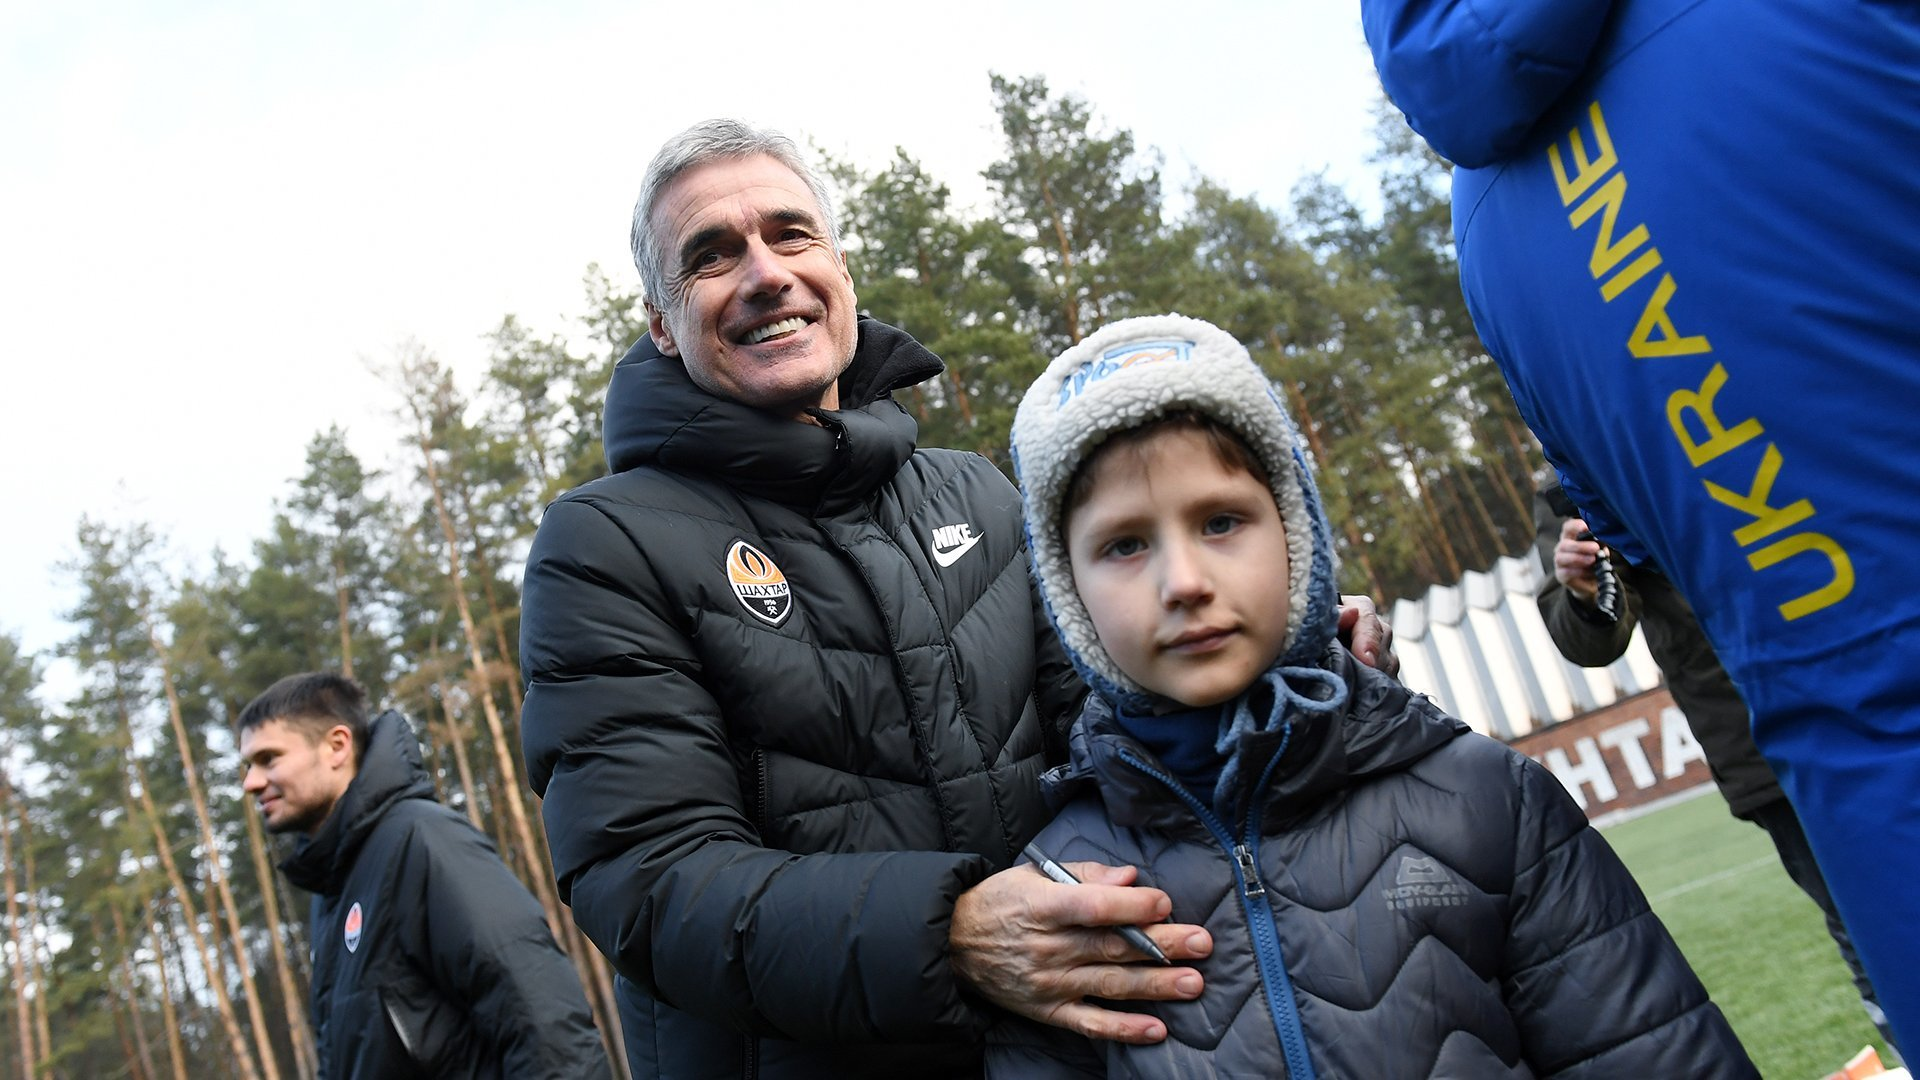 """Шахтер"" поздравил детей (+Фото) - изображение 13"